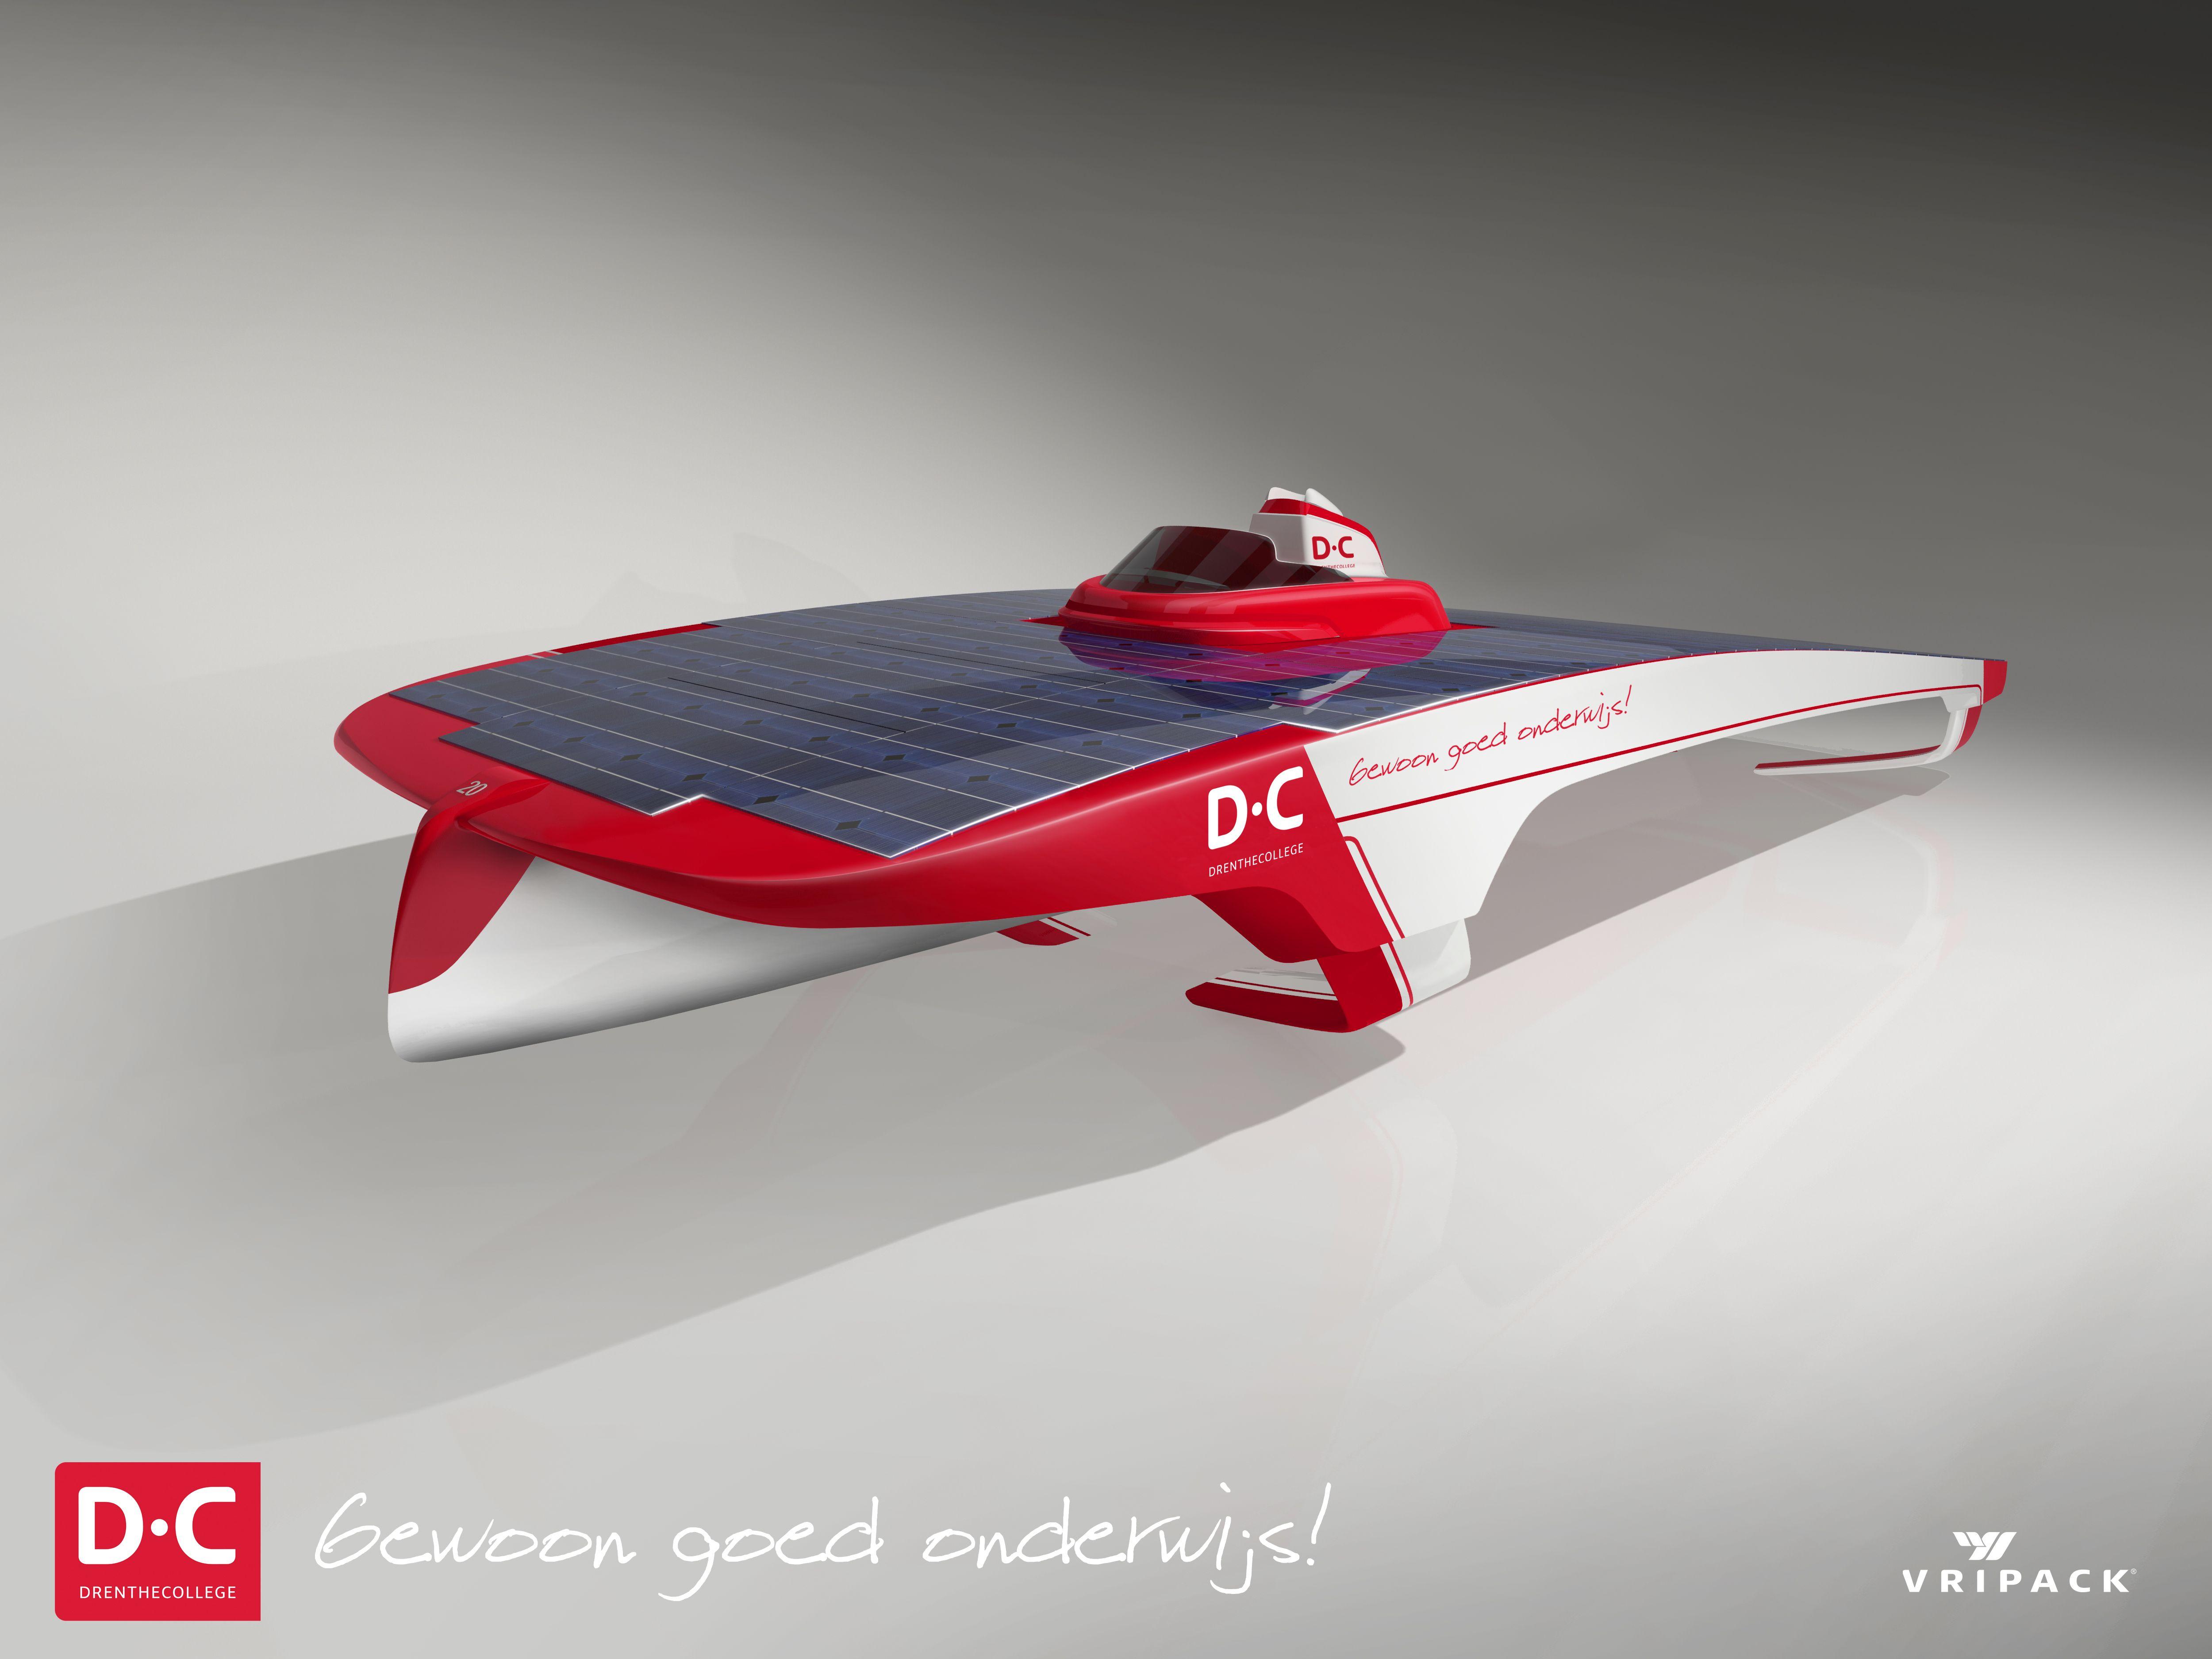 Solar Challenge, Boot 2014 - DC team